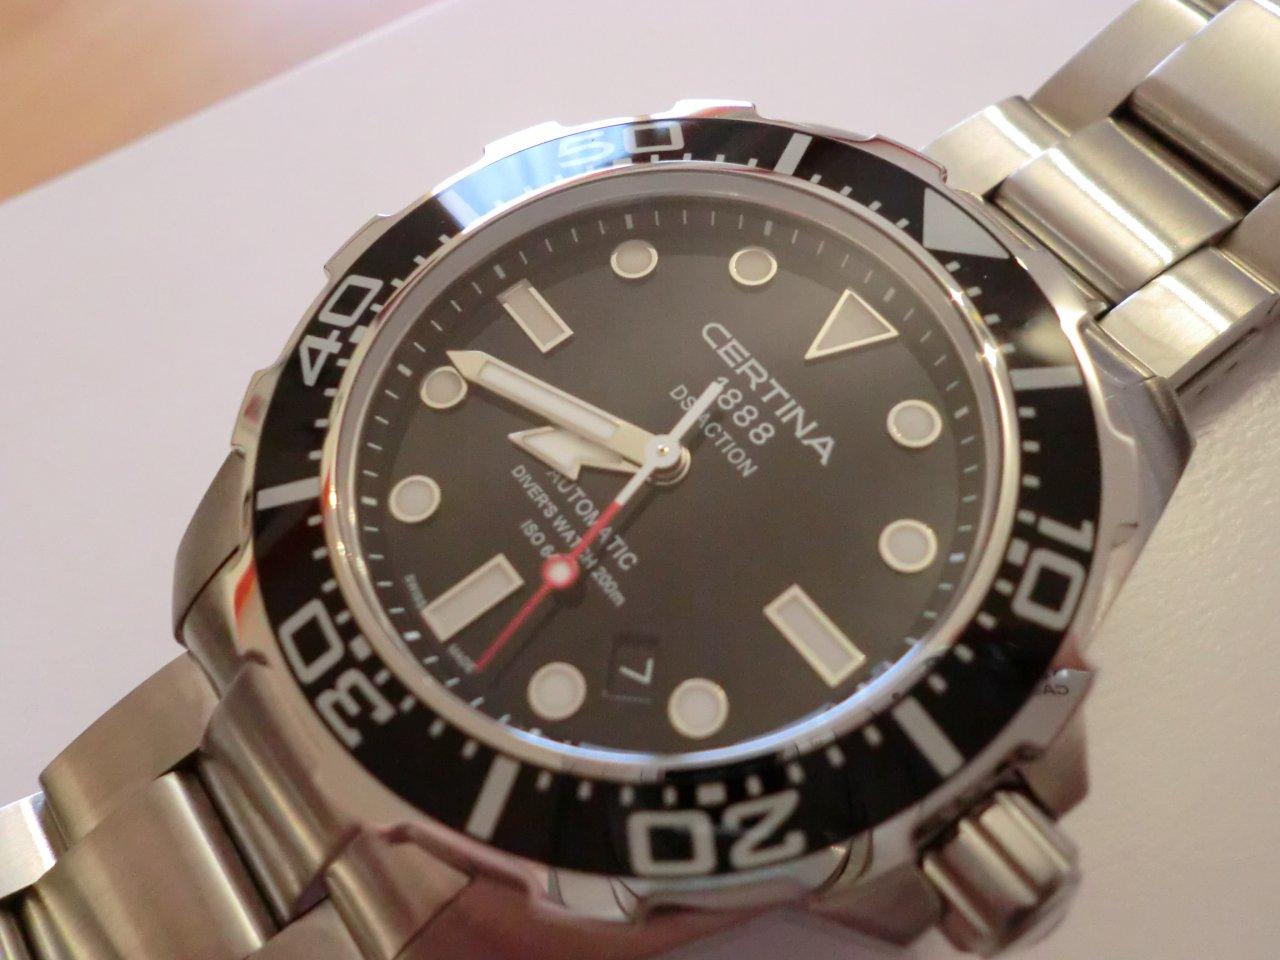 282479d1312739960-certina-ds-action-diver-automatic-cimg0190.jpg